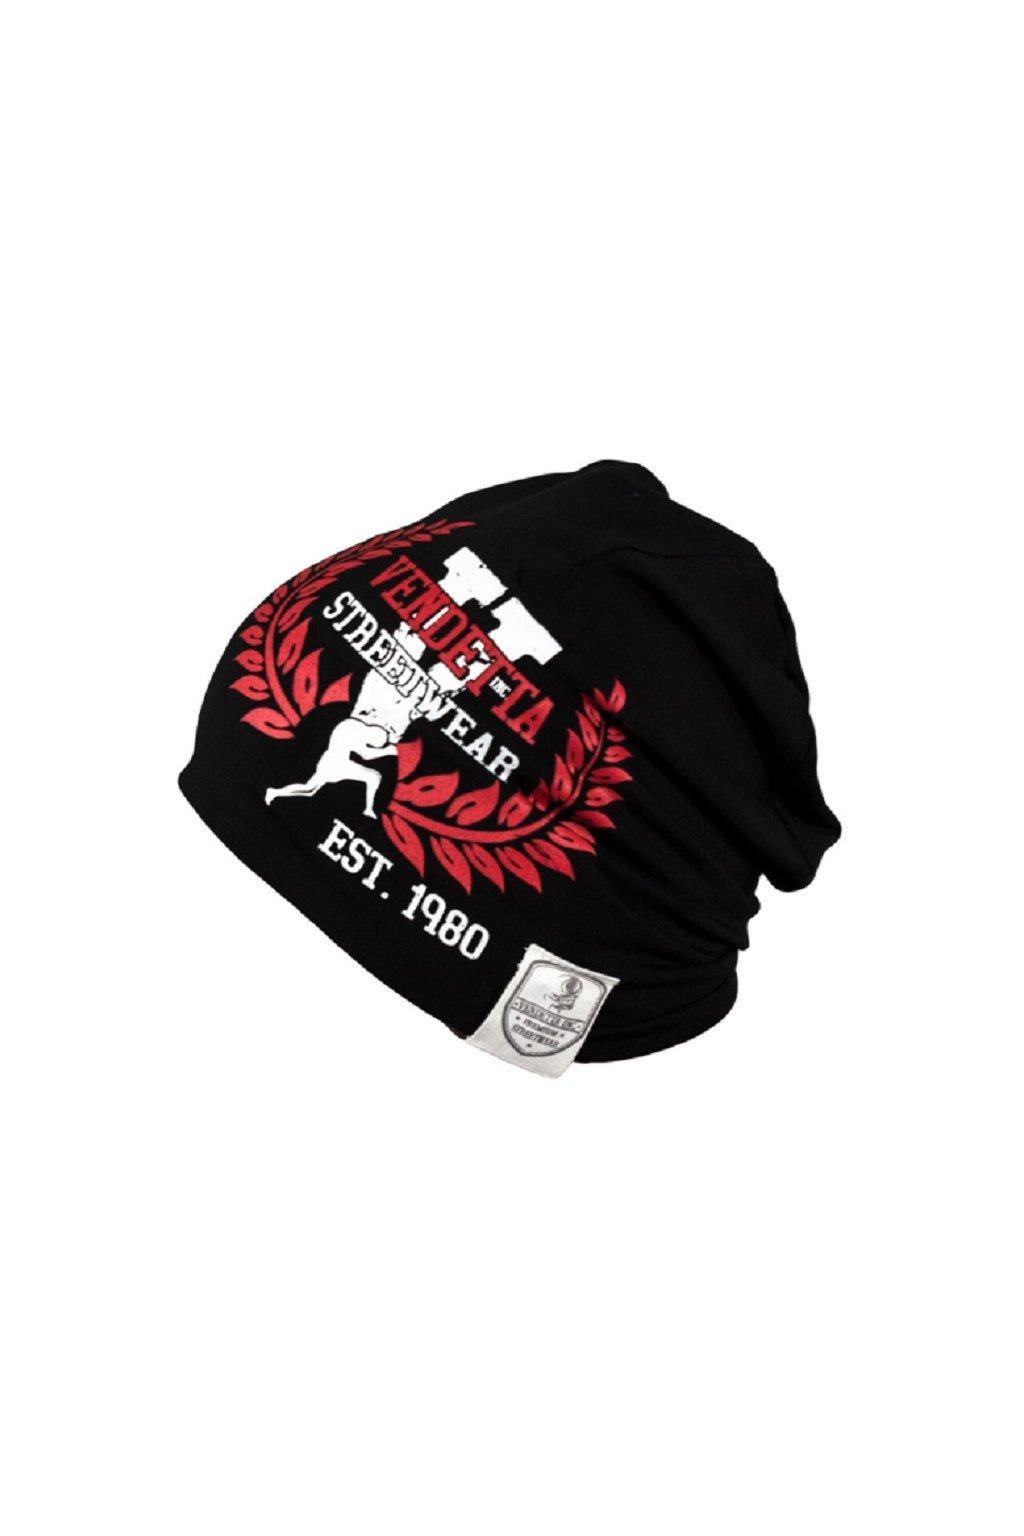 Vendetta kulich Fight streetwear obr1